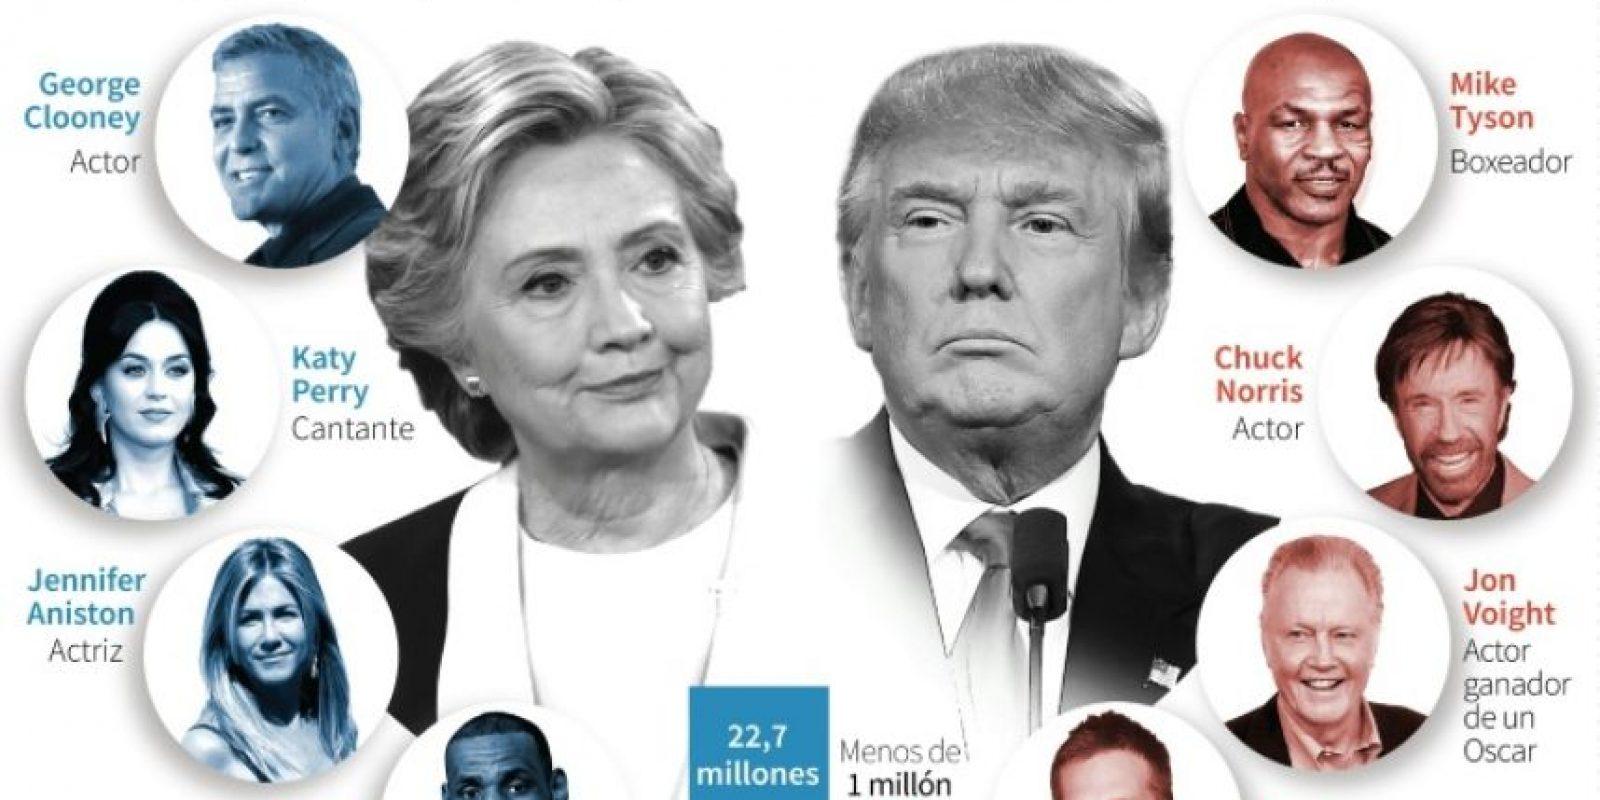 Algunas celebridades estadounidentes que apoyan a Clinton o Trump en las elecciones presidenciales Foto:Christopher HUFFAKER, John SAEKI, Gal ROMA/afp.com